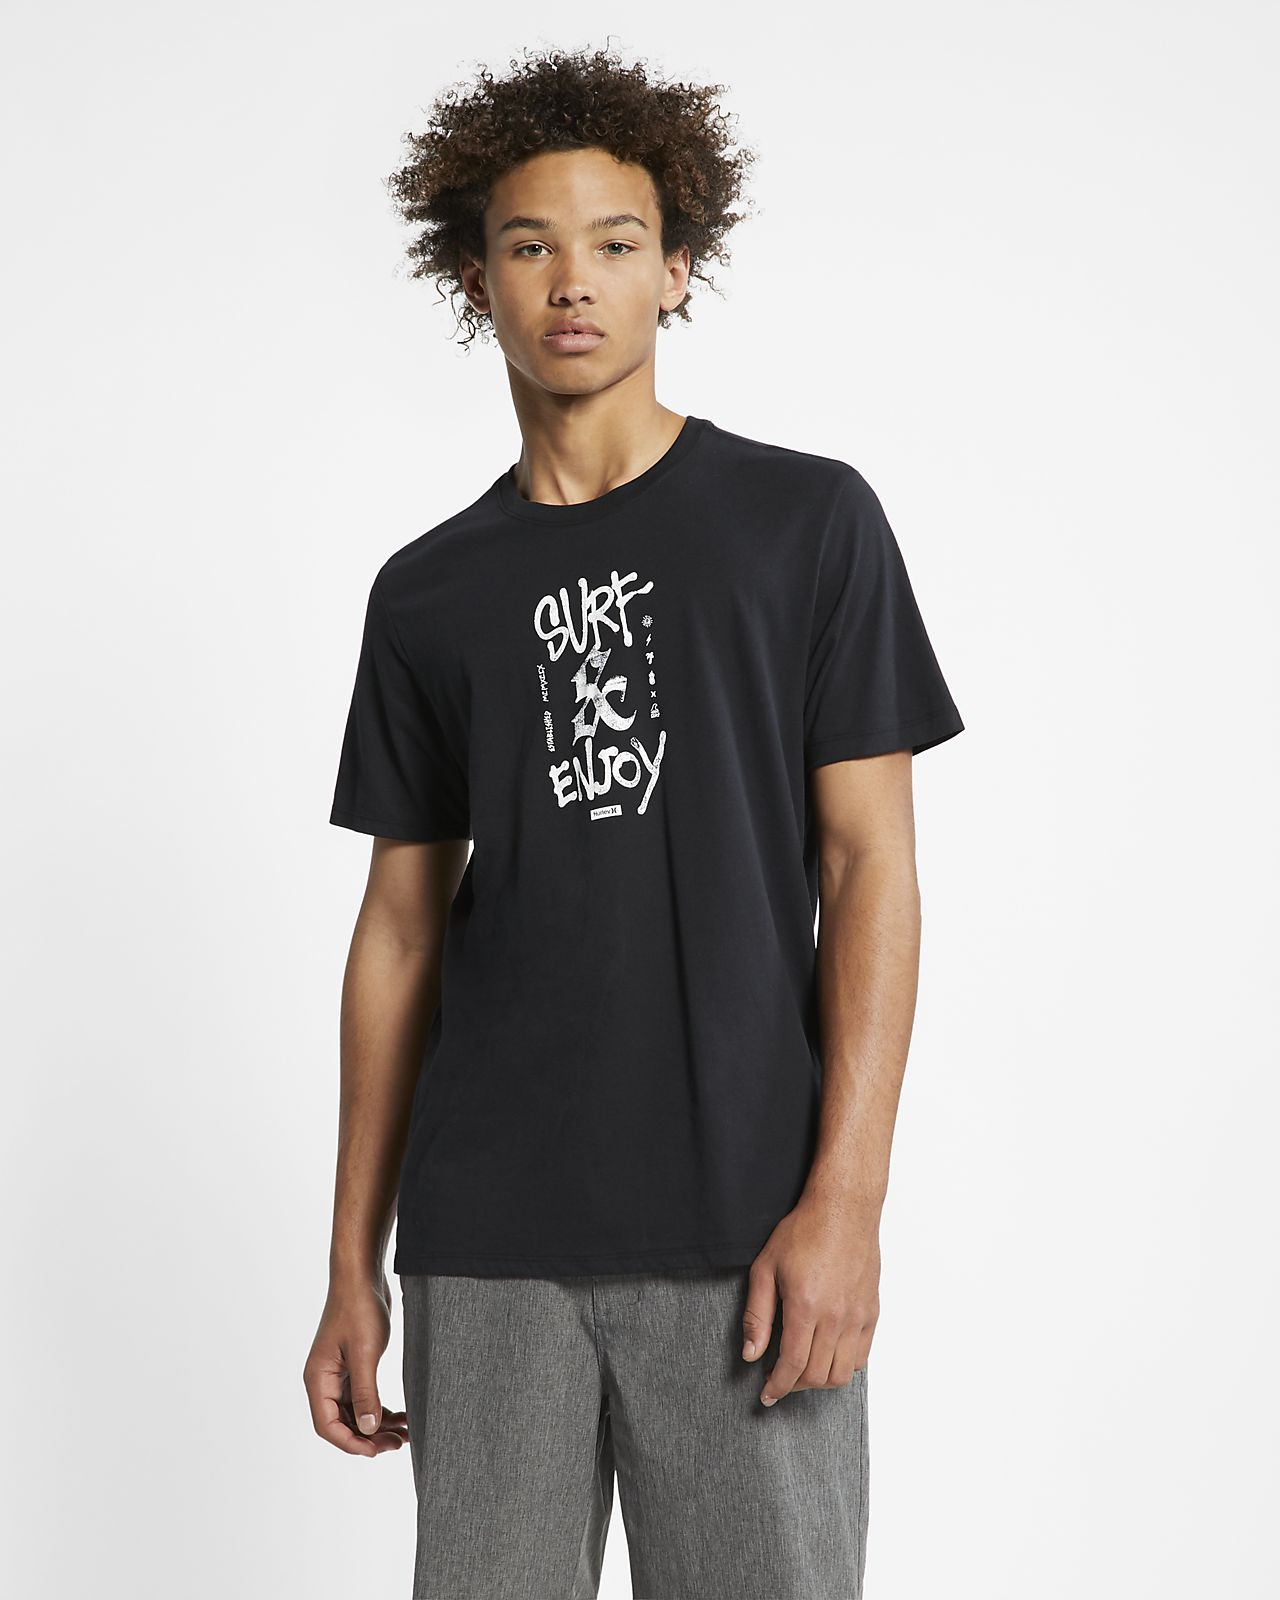 T-shirt Hurley Dri-FIT Surf And Enjoy - Uomo